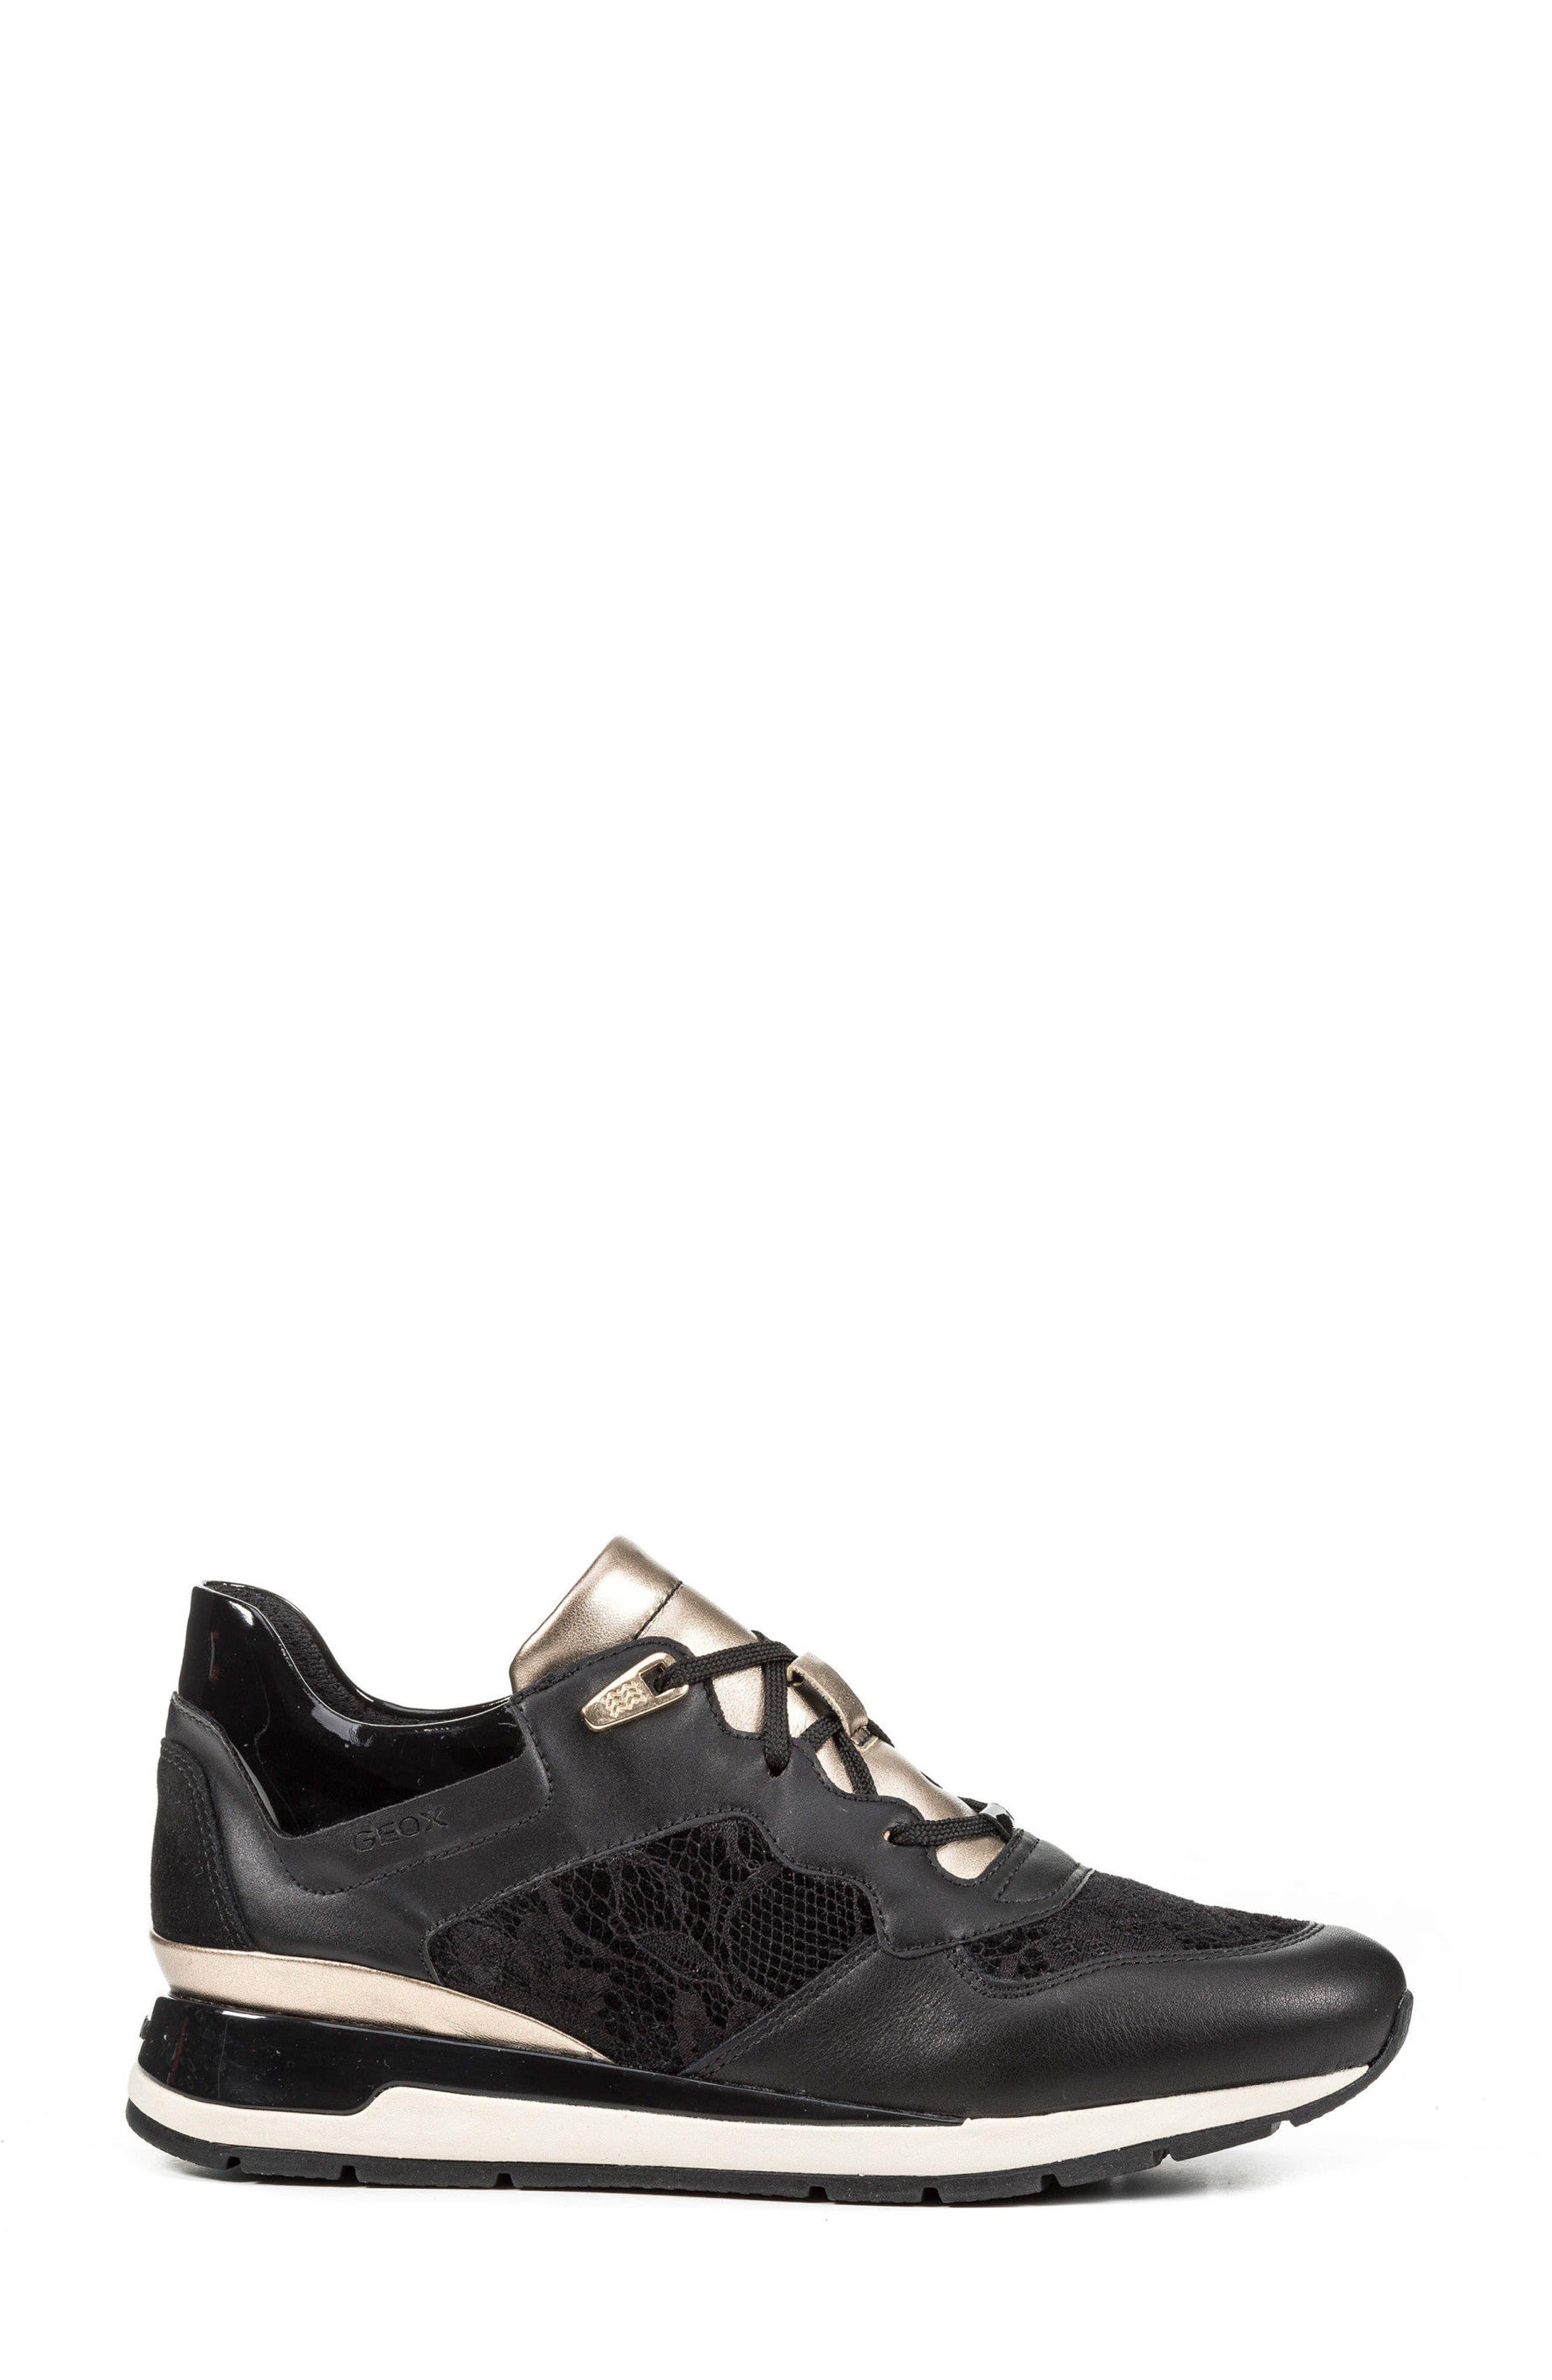 Shahira Sneaker,                             Alternate thumbnail 3, color,                             001